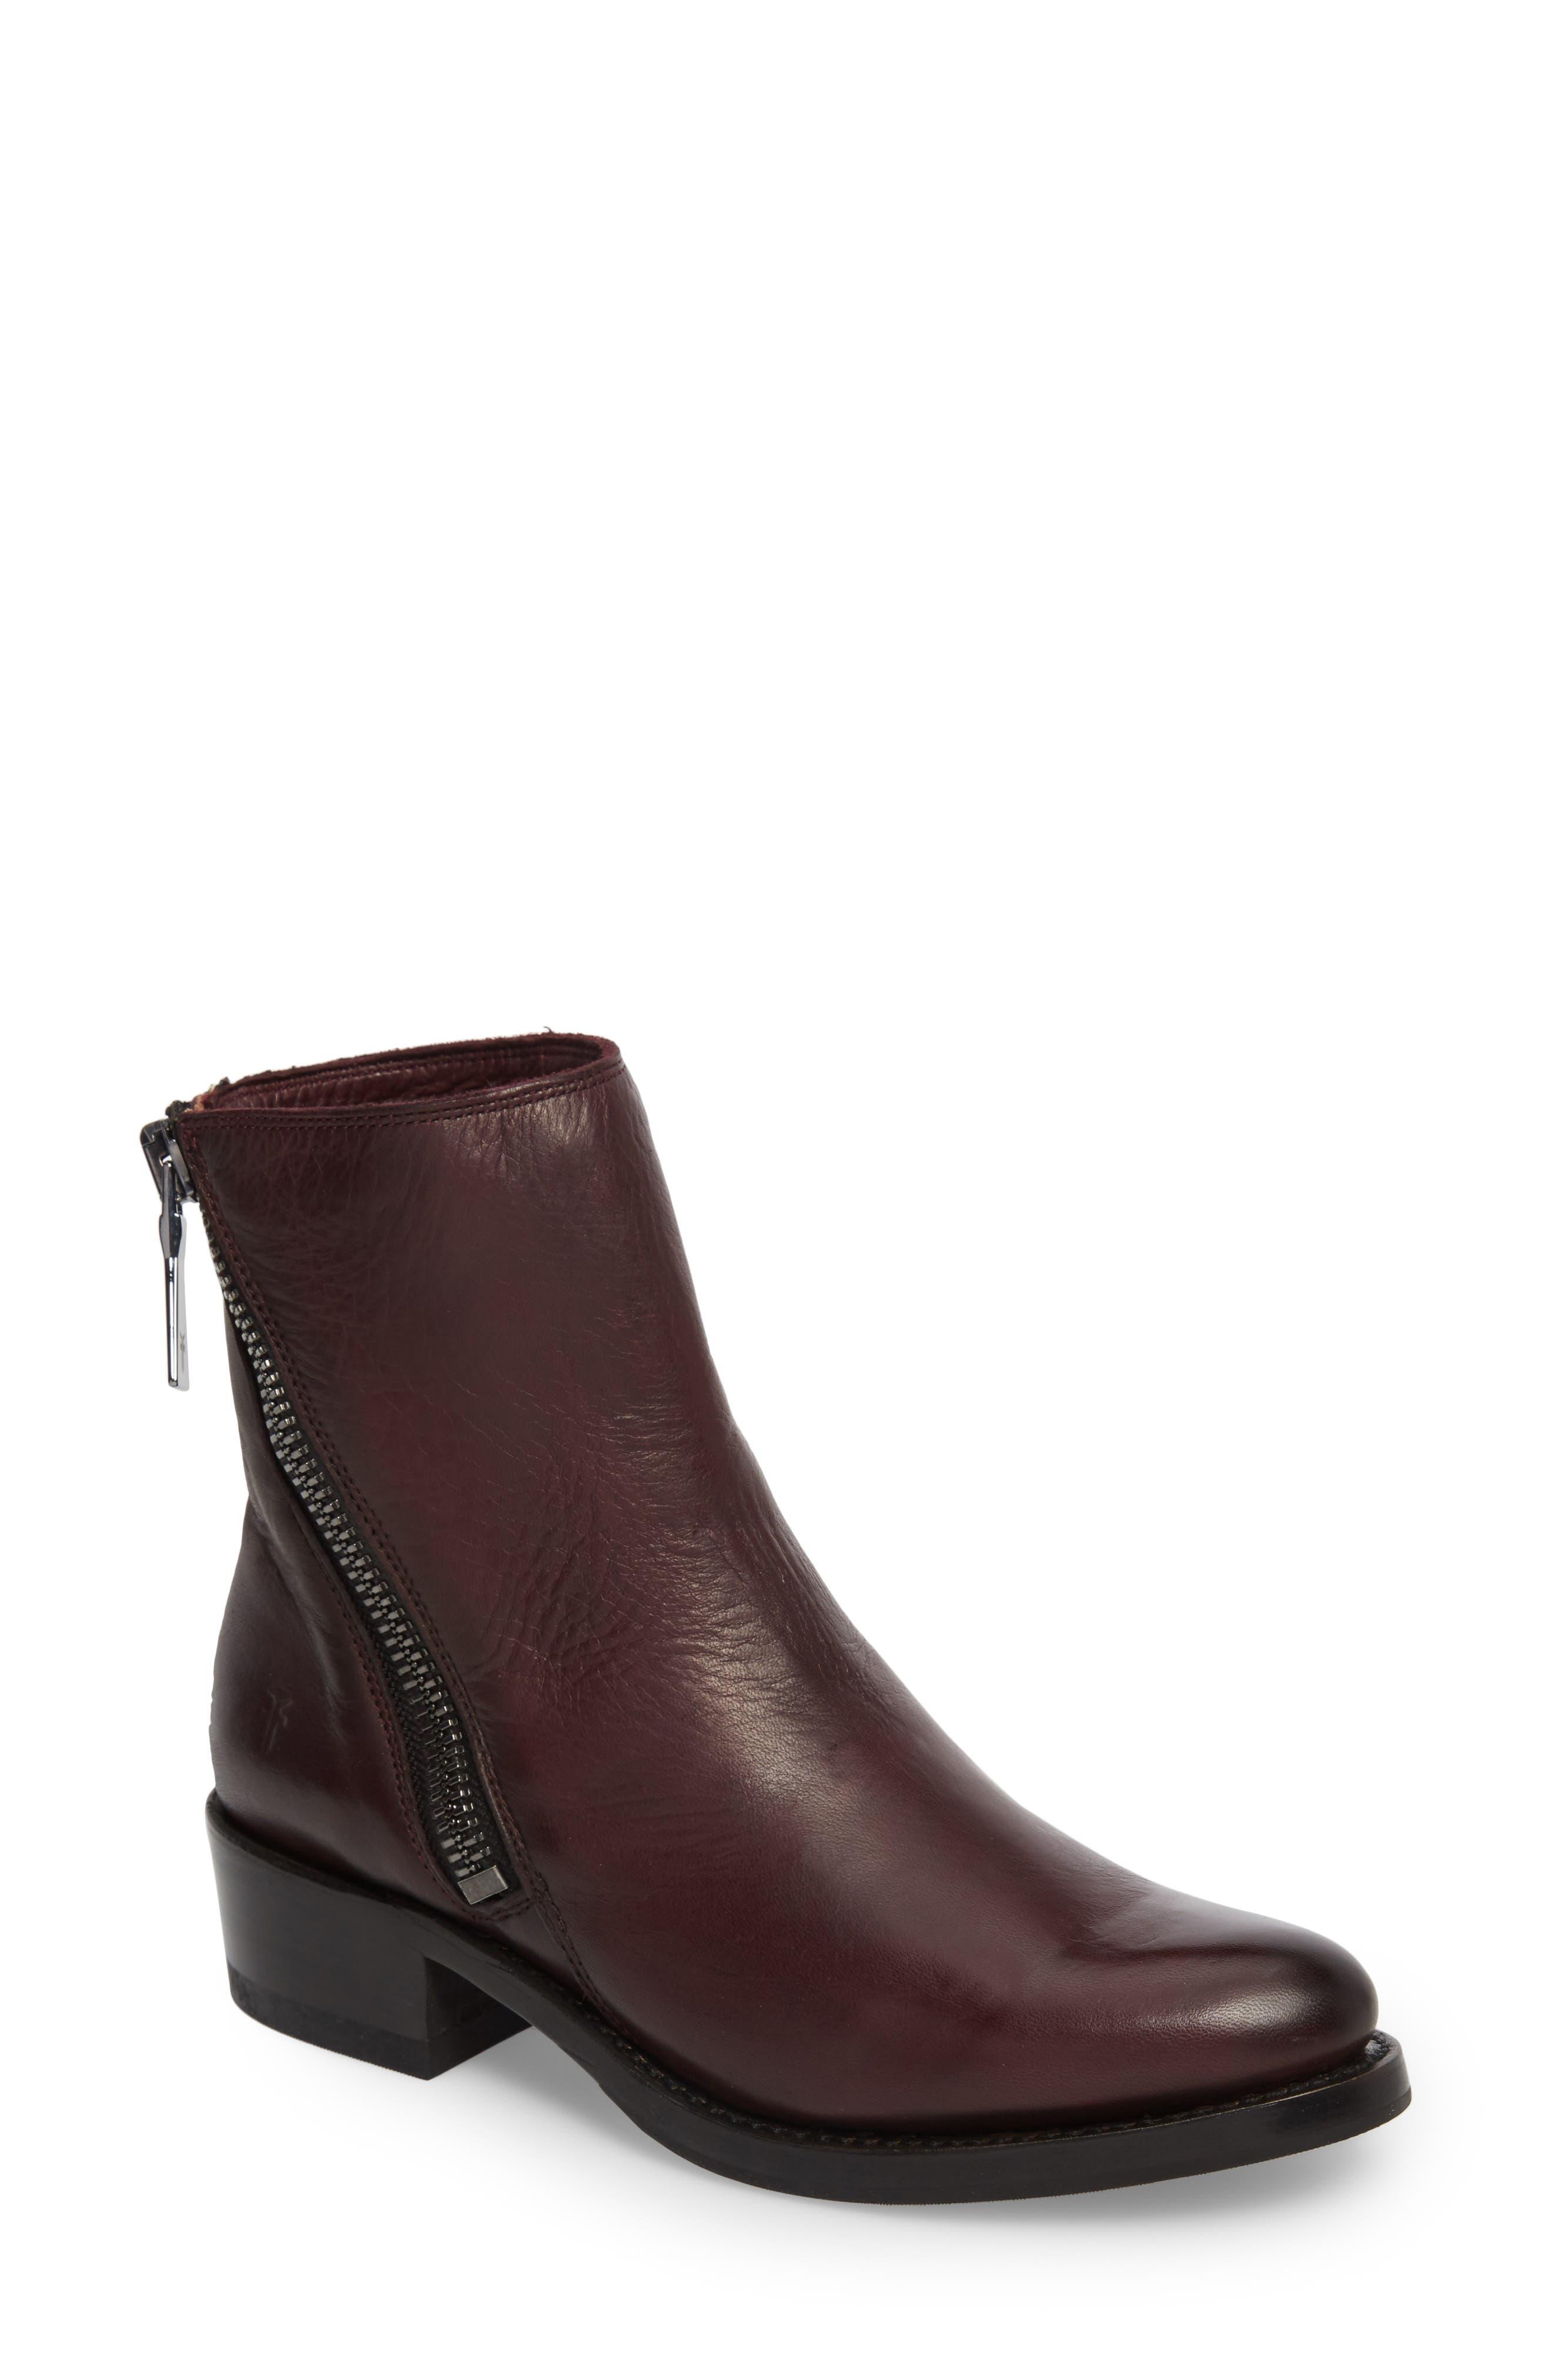 Demi Zip Bootie,                         Main,                         color, Wine Leather